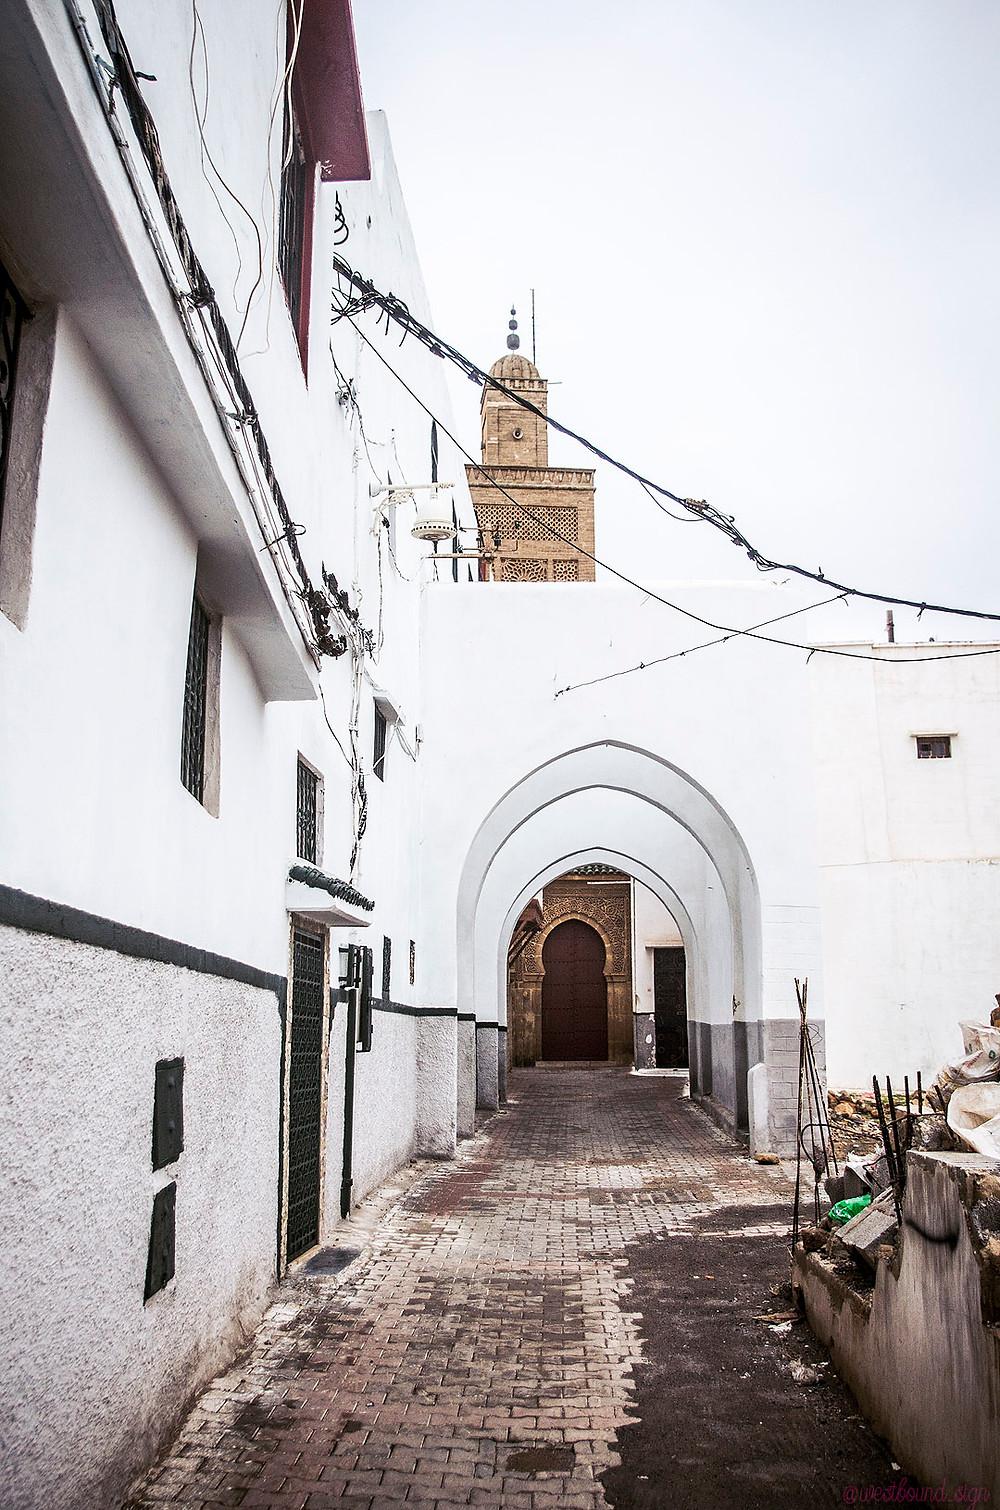 Grand Mosque of Sale Minaret